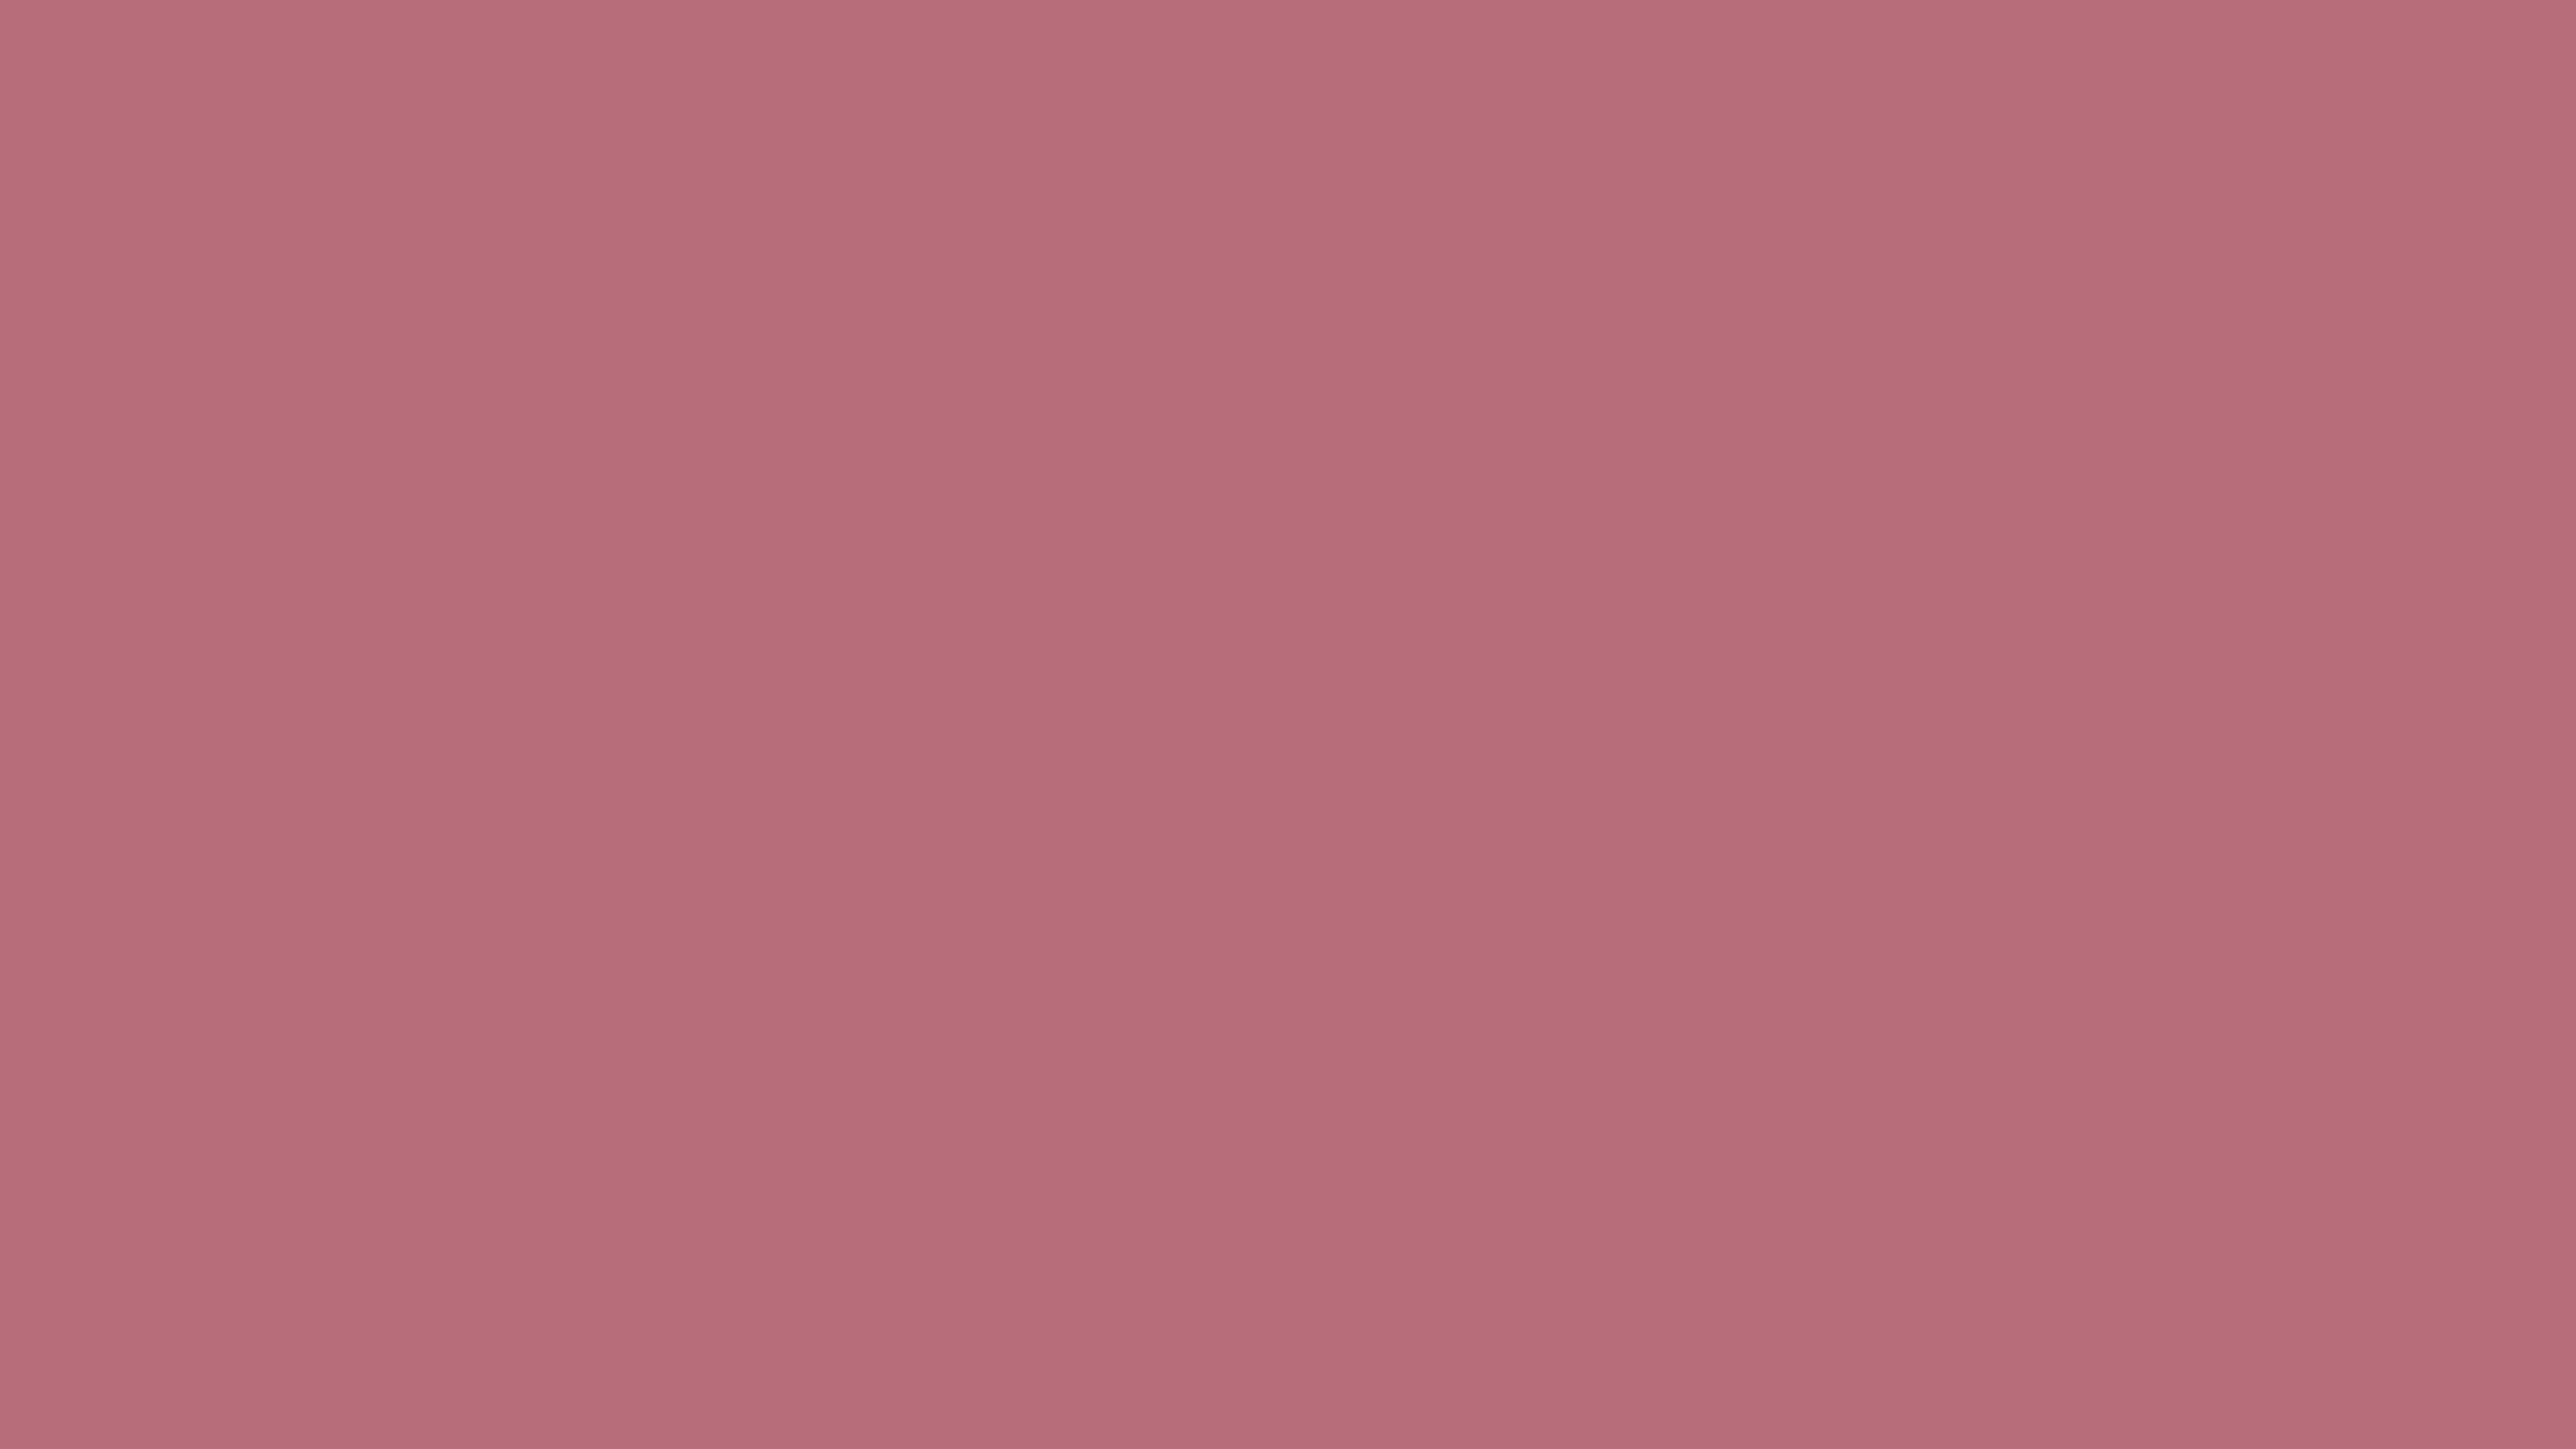 5120x2880 Rose Gold Solid Color Background